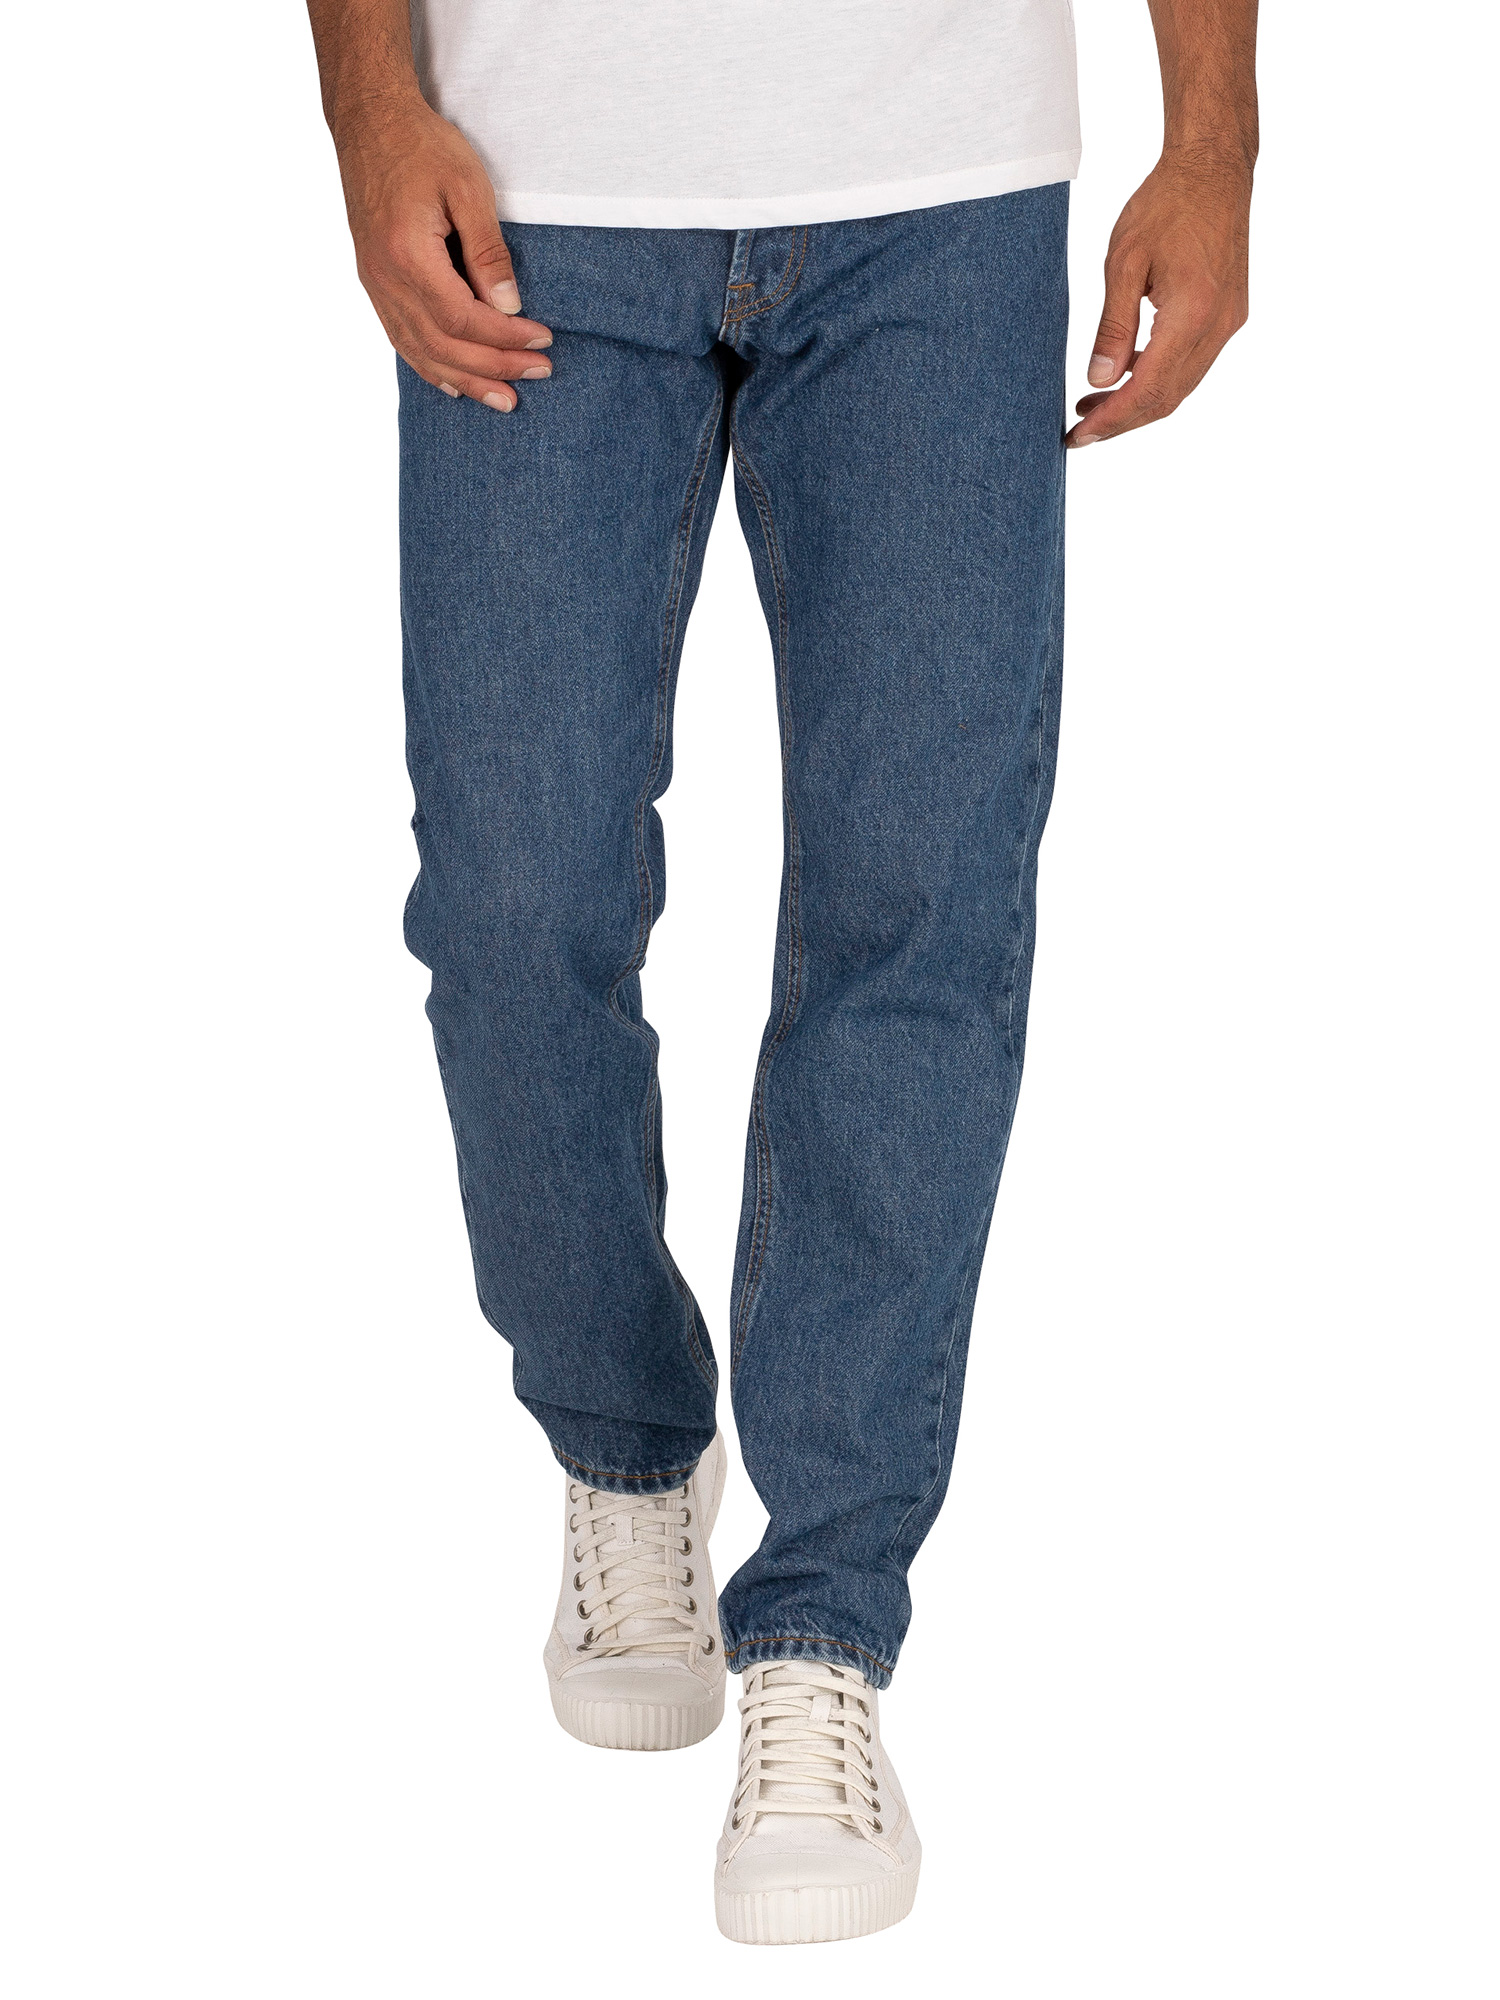 Mike-Original-143-Jeans